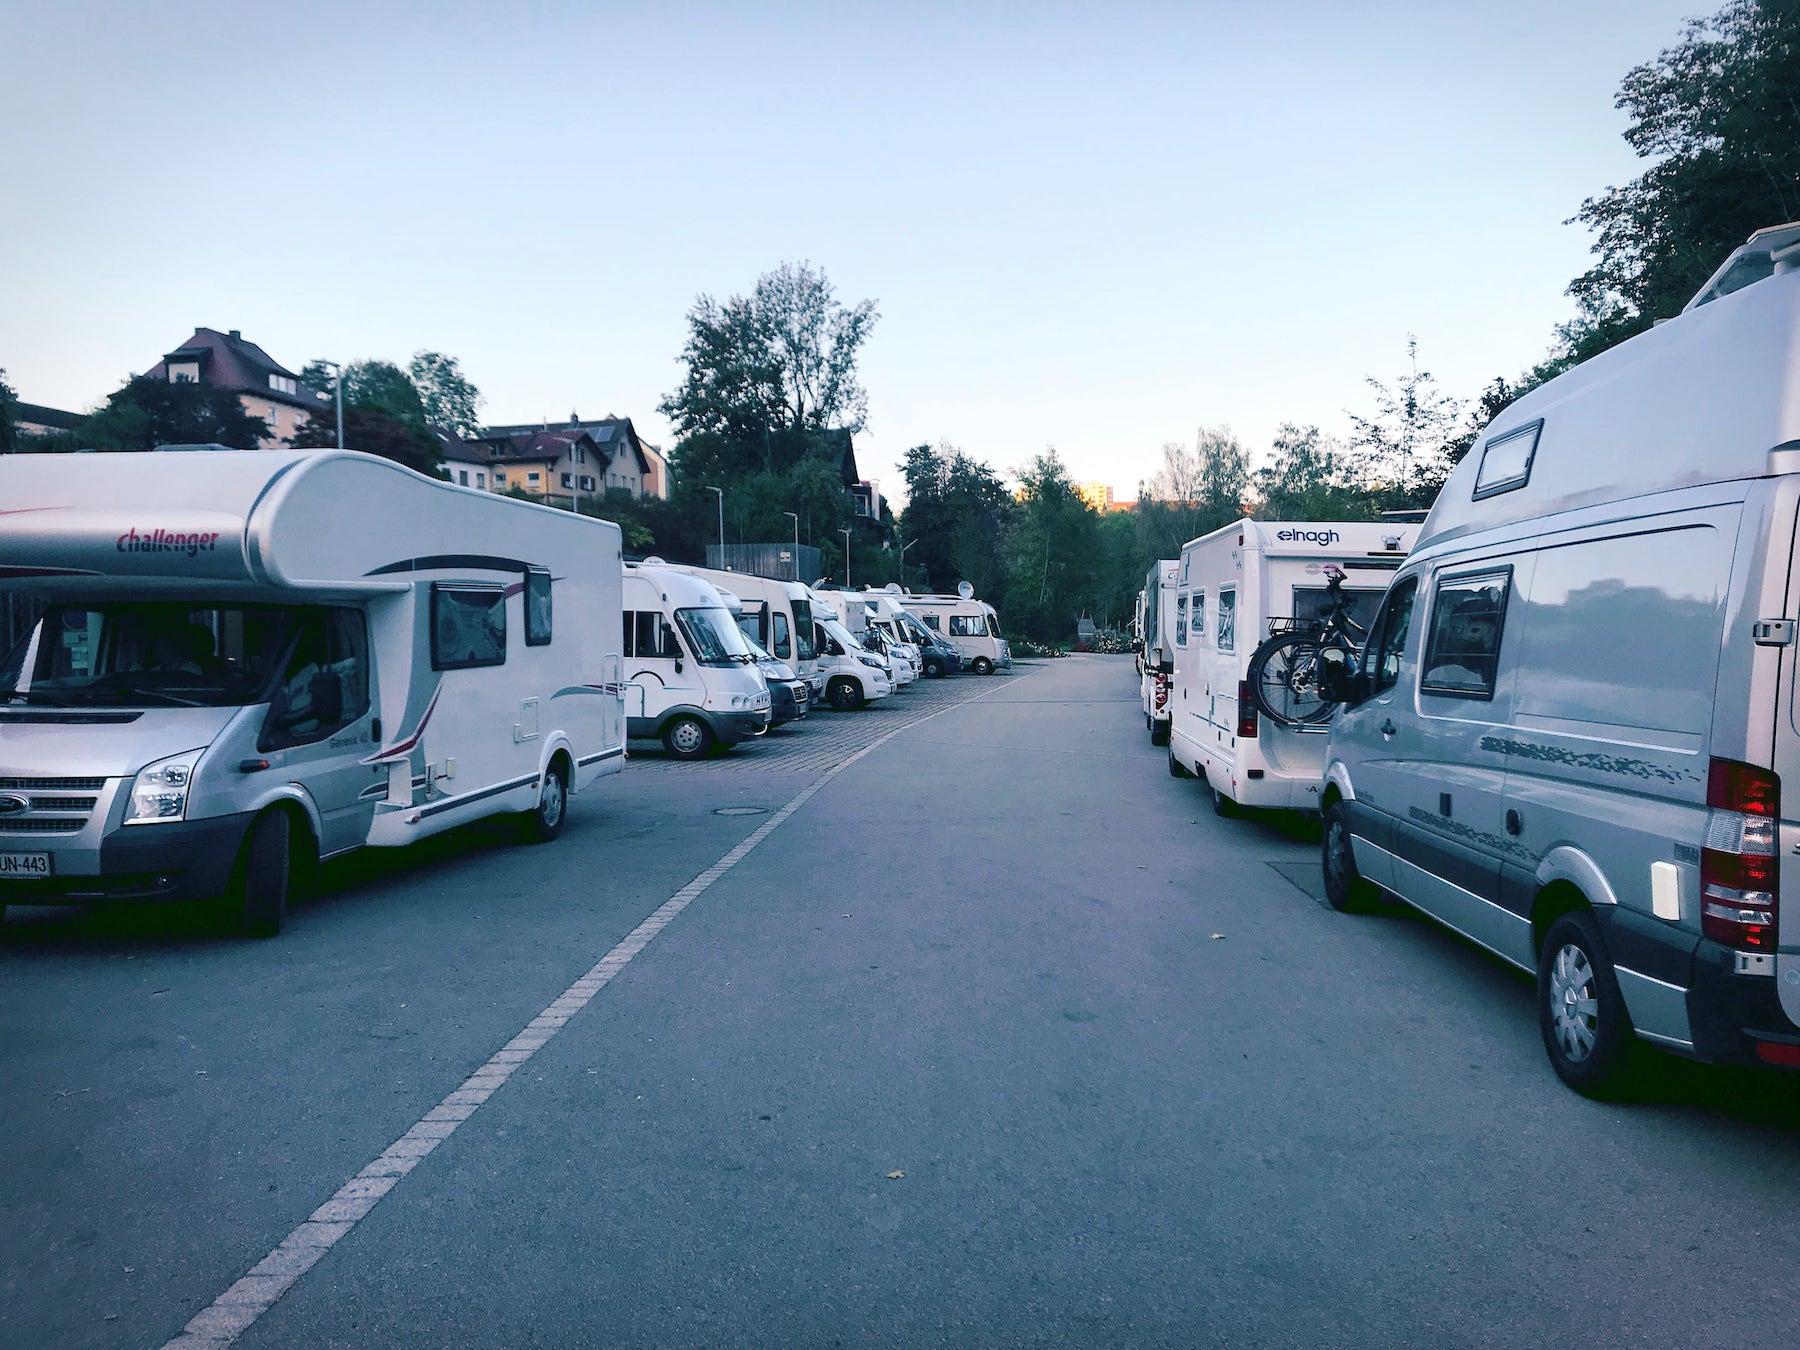 Echt camping im Sommer